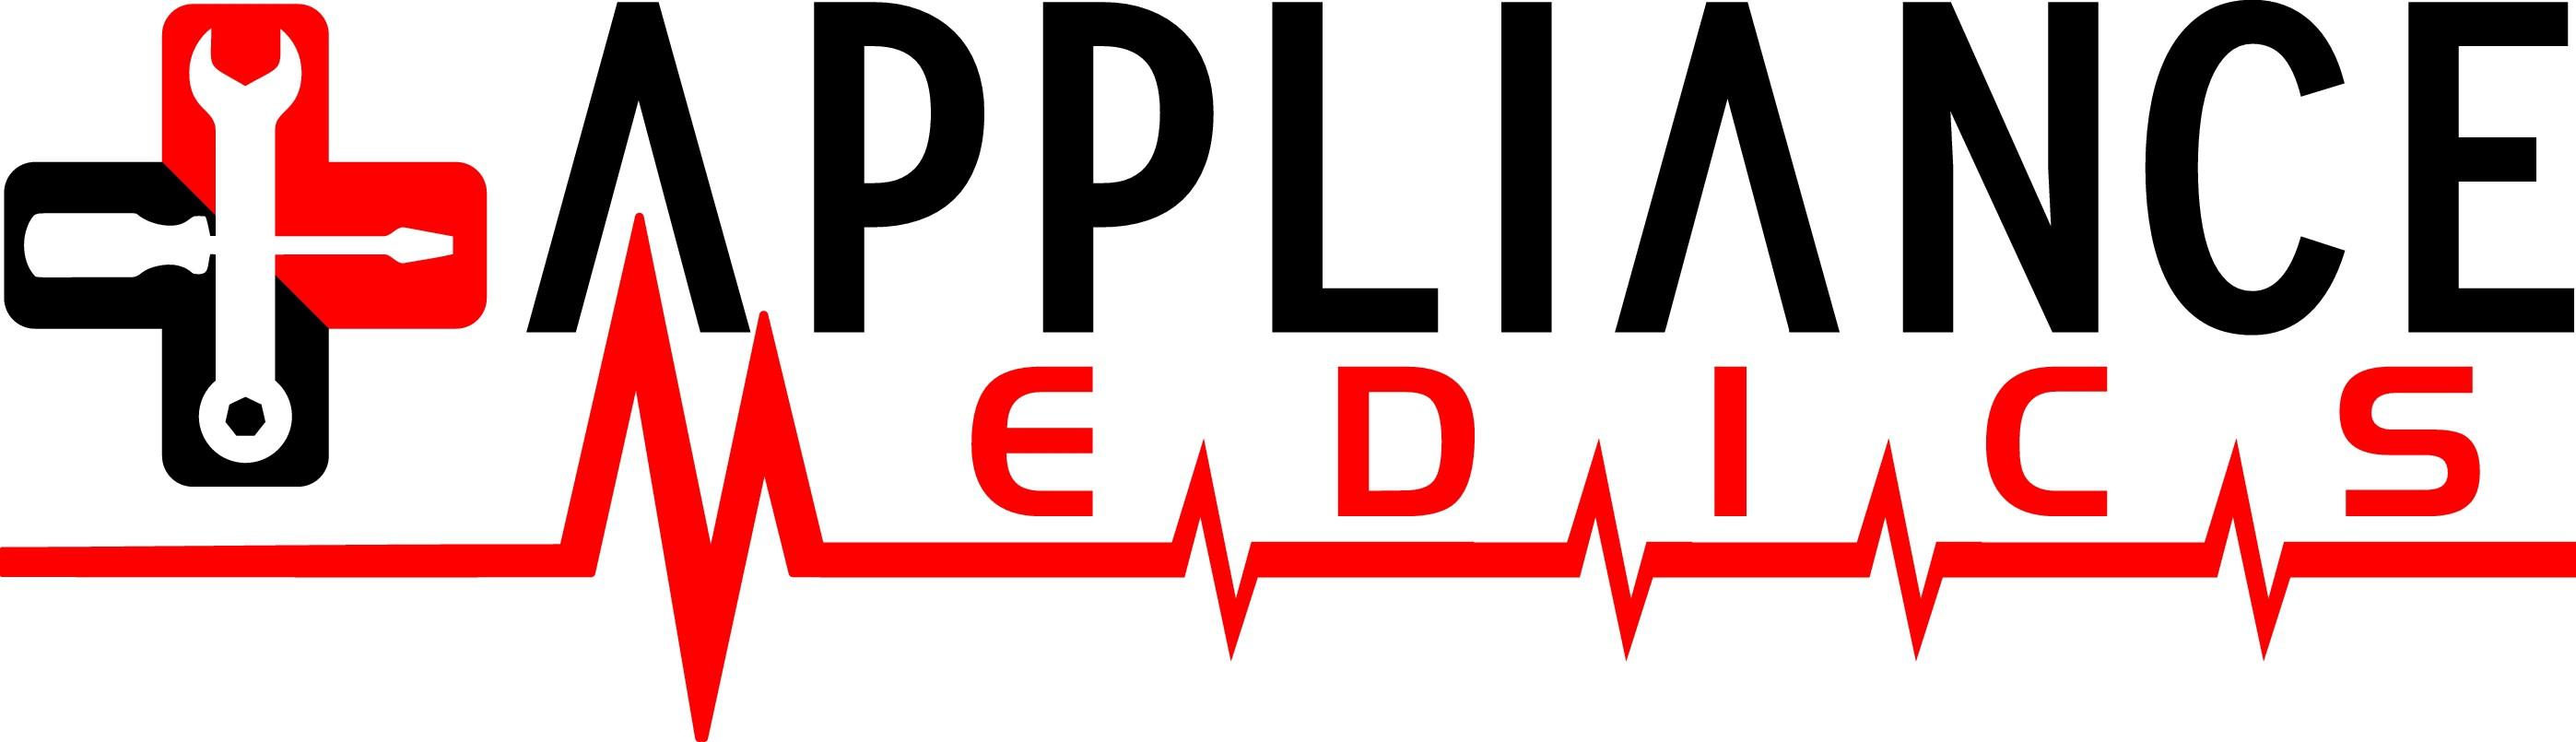 ++++ :) Combine Appliance Repair w/ Medical Field Service Company Logo for Appliance Medics